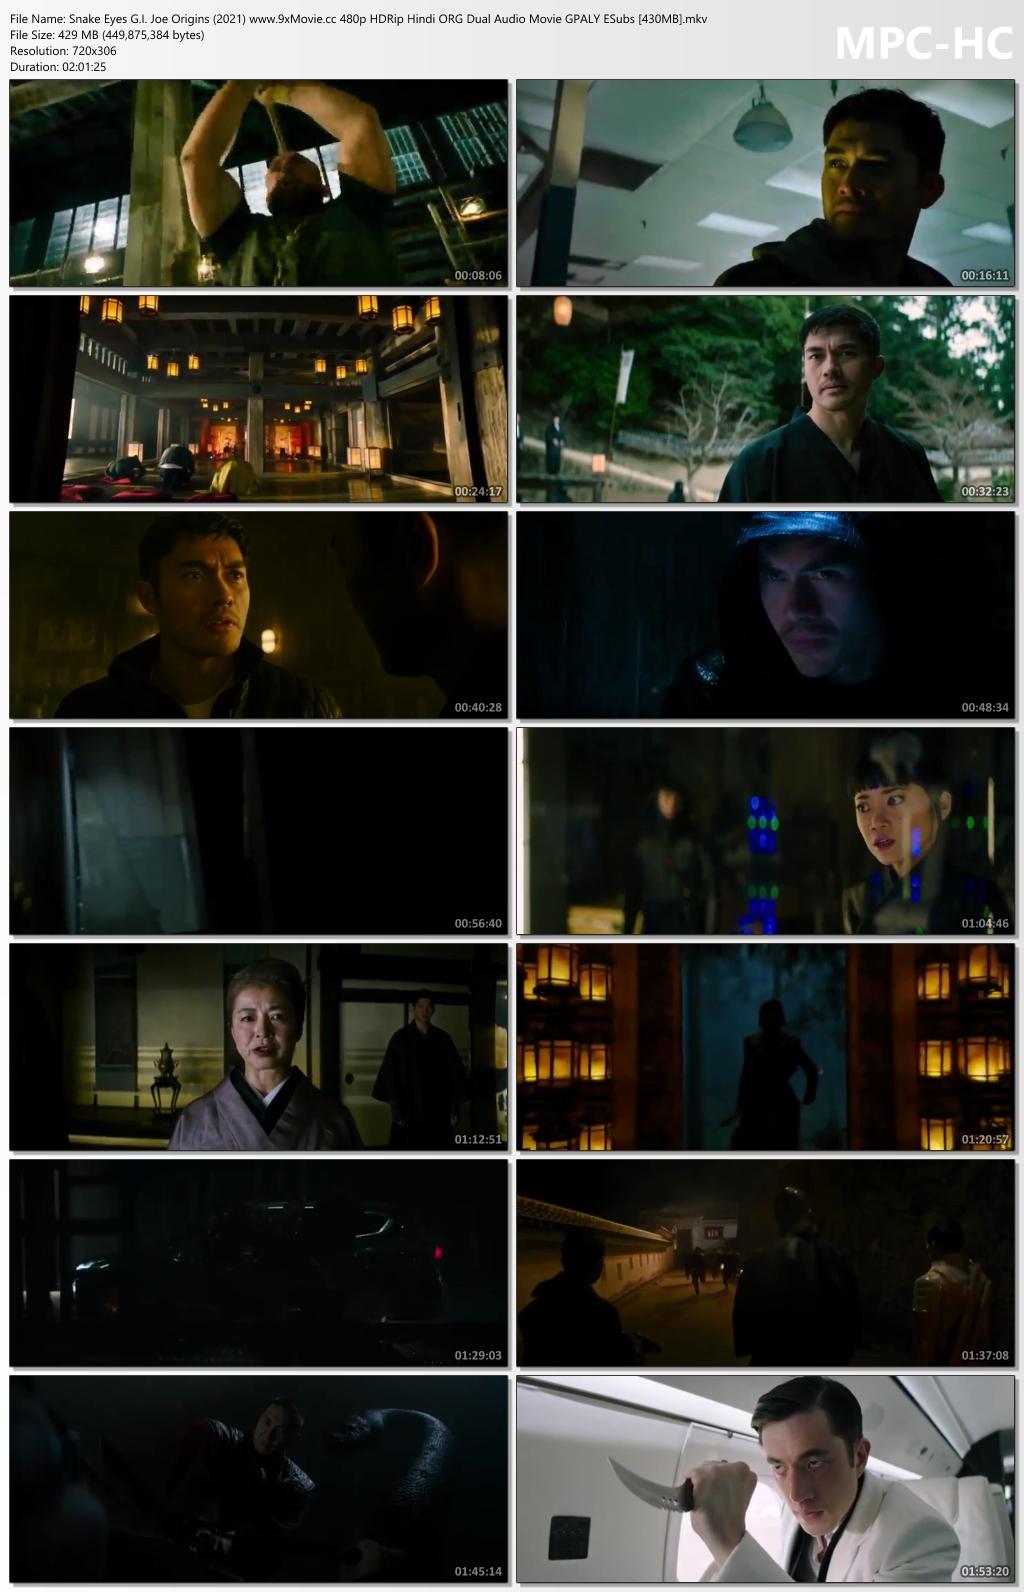 Snake-Eyes-G-I-Joe-Origins-2021-www-9x-Movie-cc-480p-HDRip-Hindi-ORG-Dual-Audio-Movie-GPALY-ESubs-43